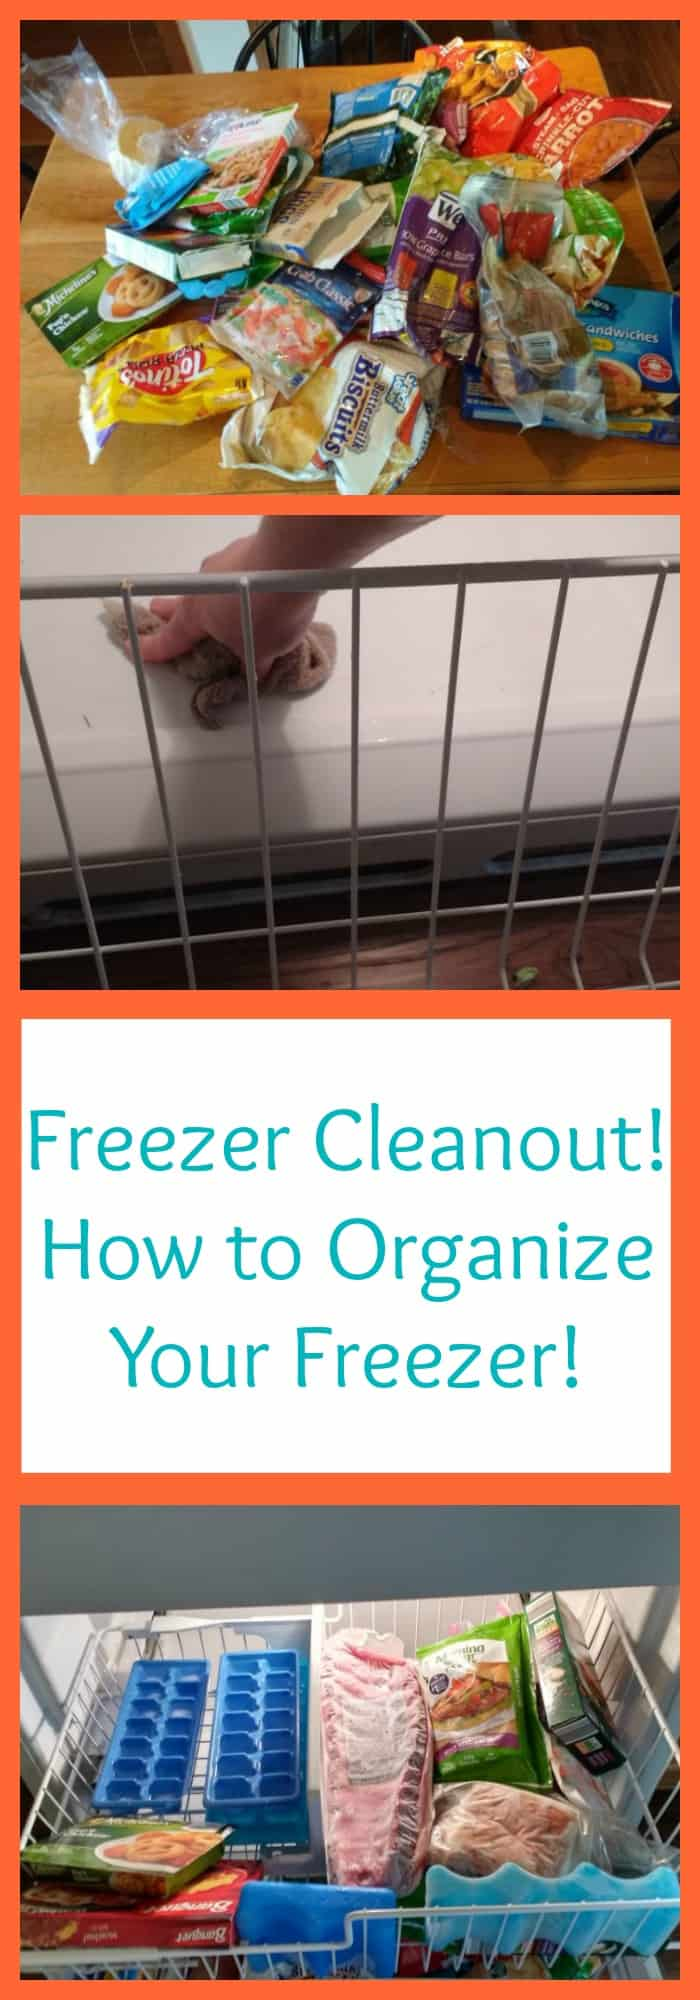 Freezer Cleanout--How to Organize Your Freezer